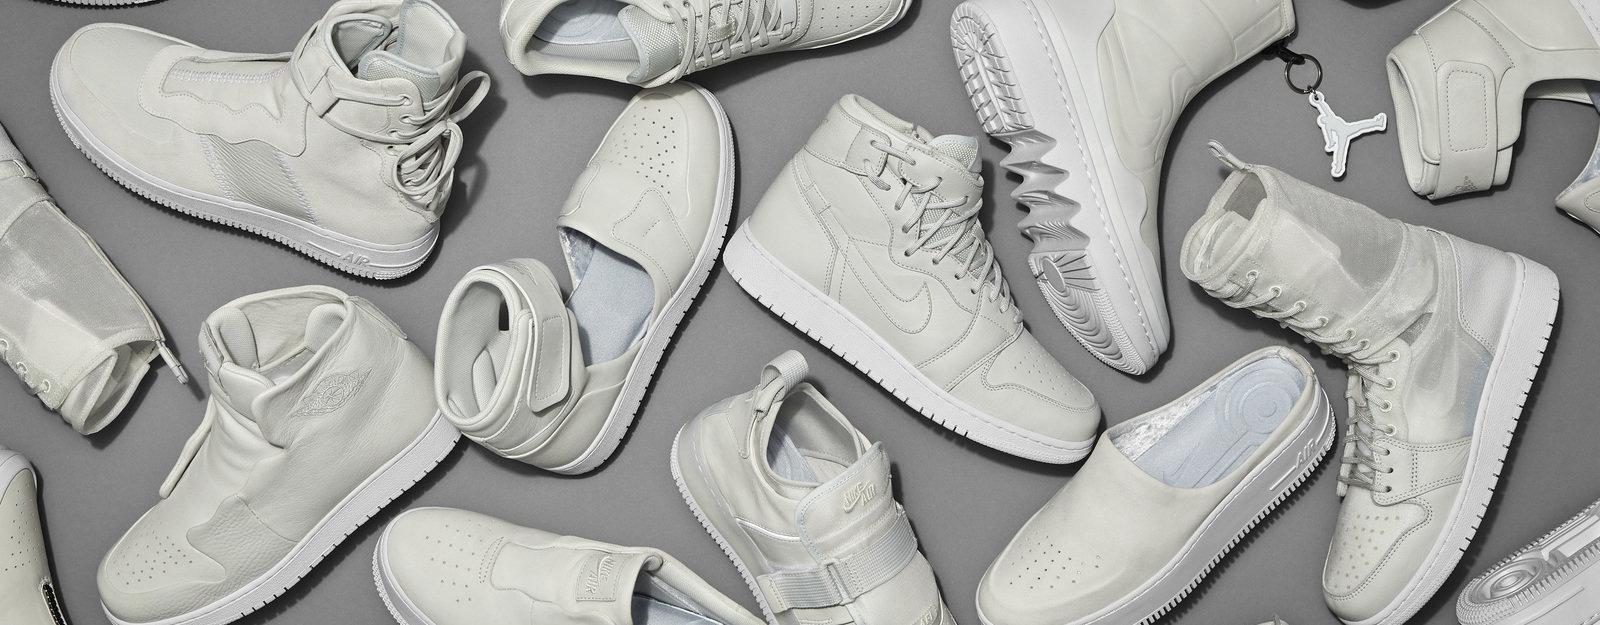 3e00d908b05a76 Nike s Research-Driven